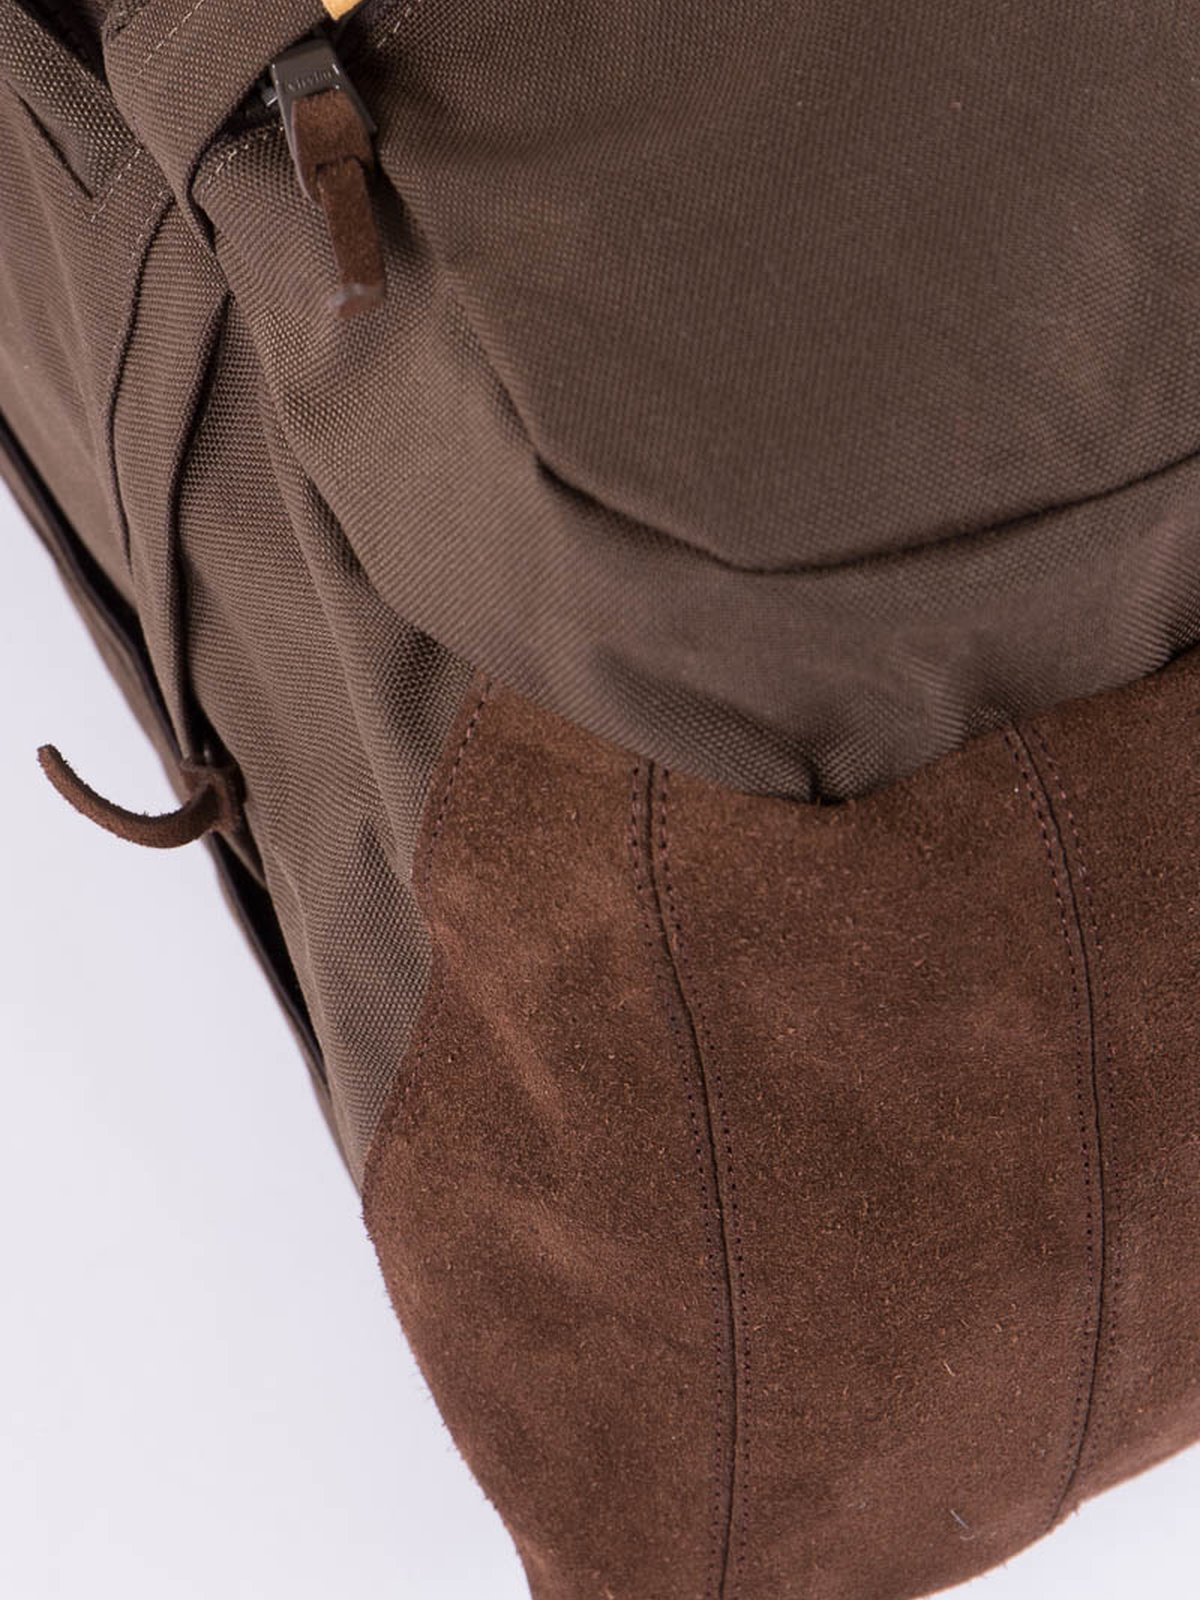 Brown 22L Ballistic Backpack - Image 2